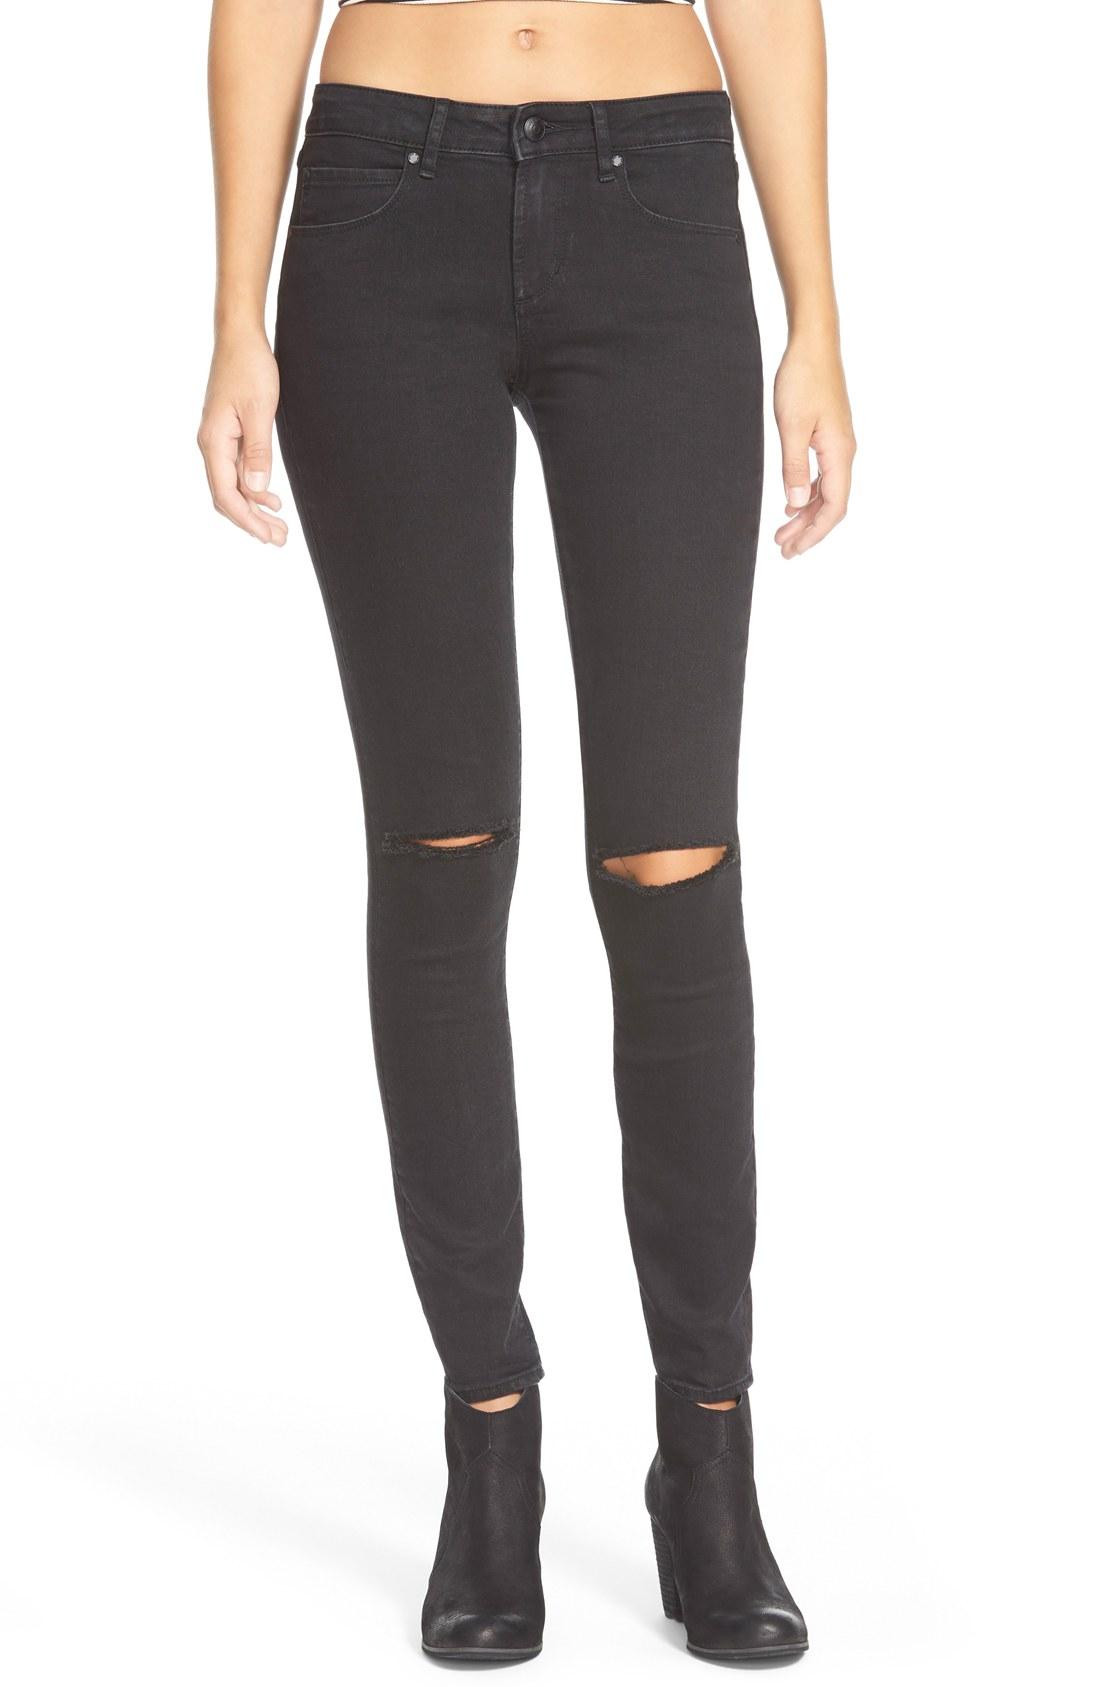 9d6b485065 Articles of Society  Sarah  Distressed Skinny Jeans (Black Cat ...